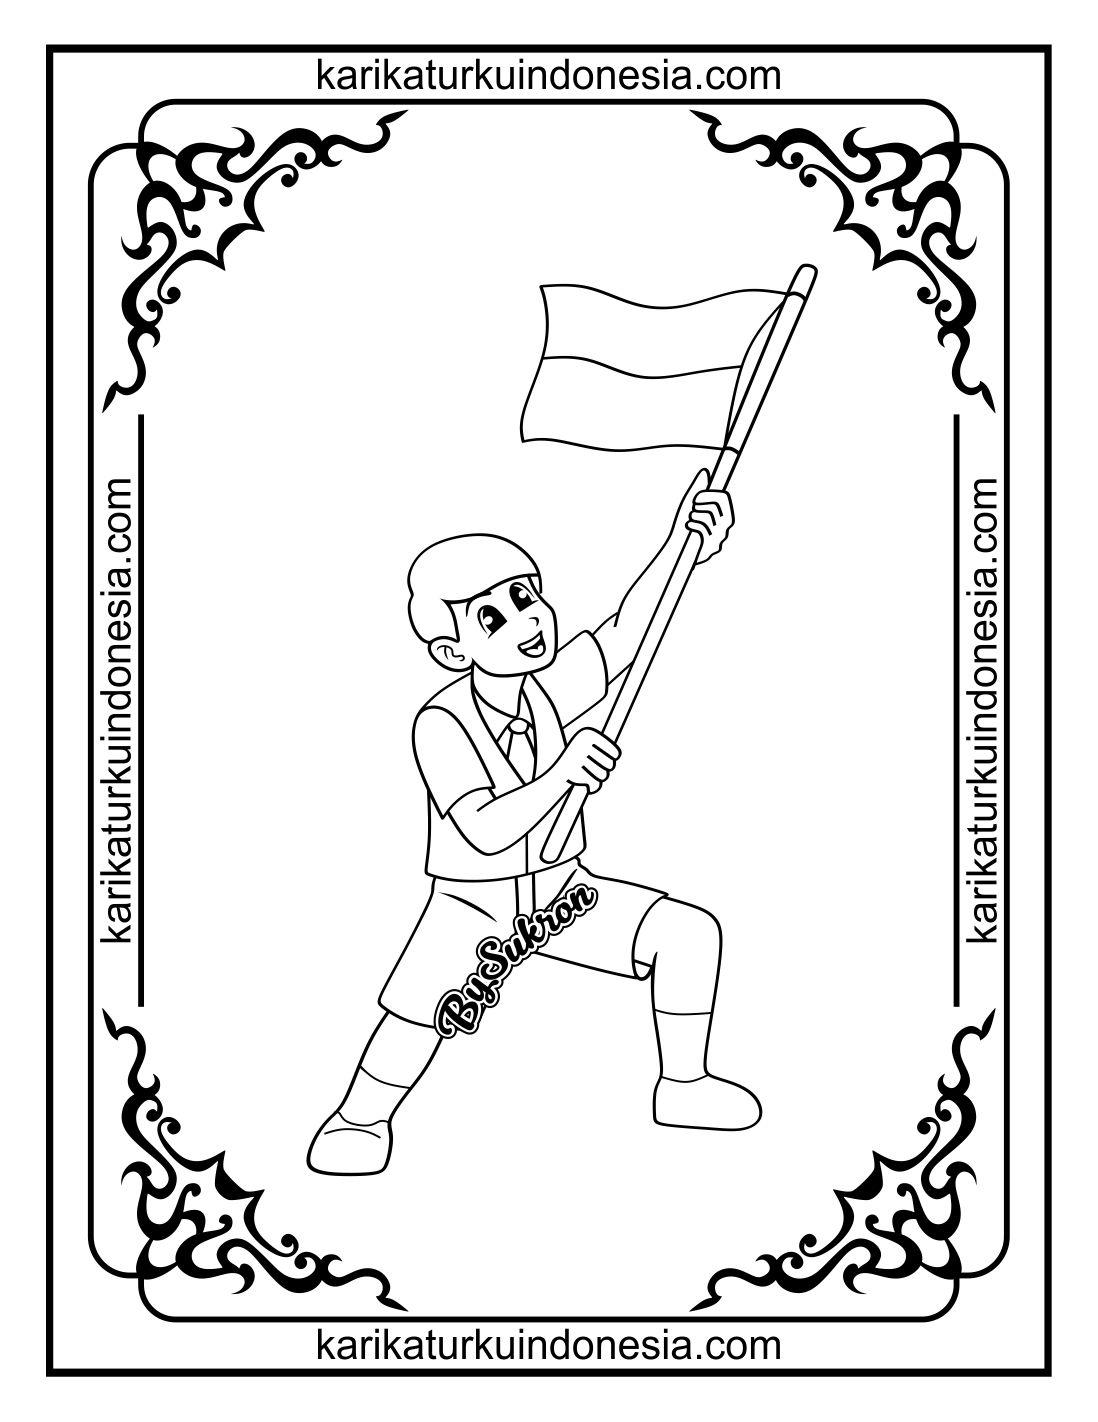 Karikaturku Indonesia Mewarnai Gambar Anak Mengibarkan Bendera